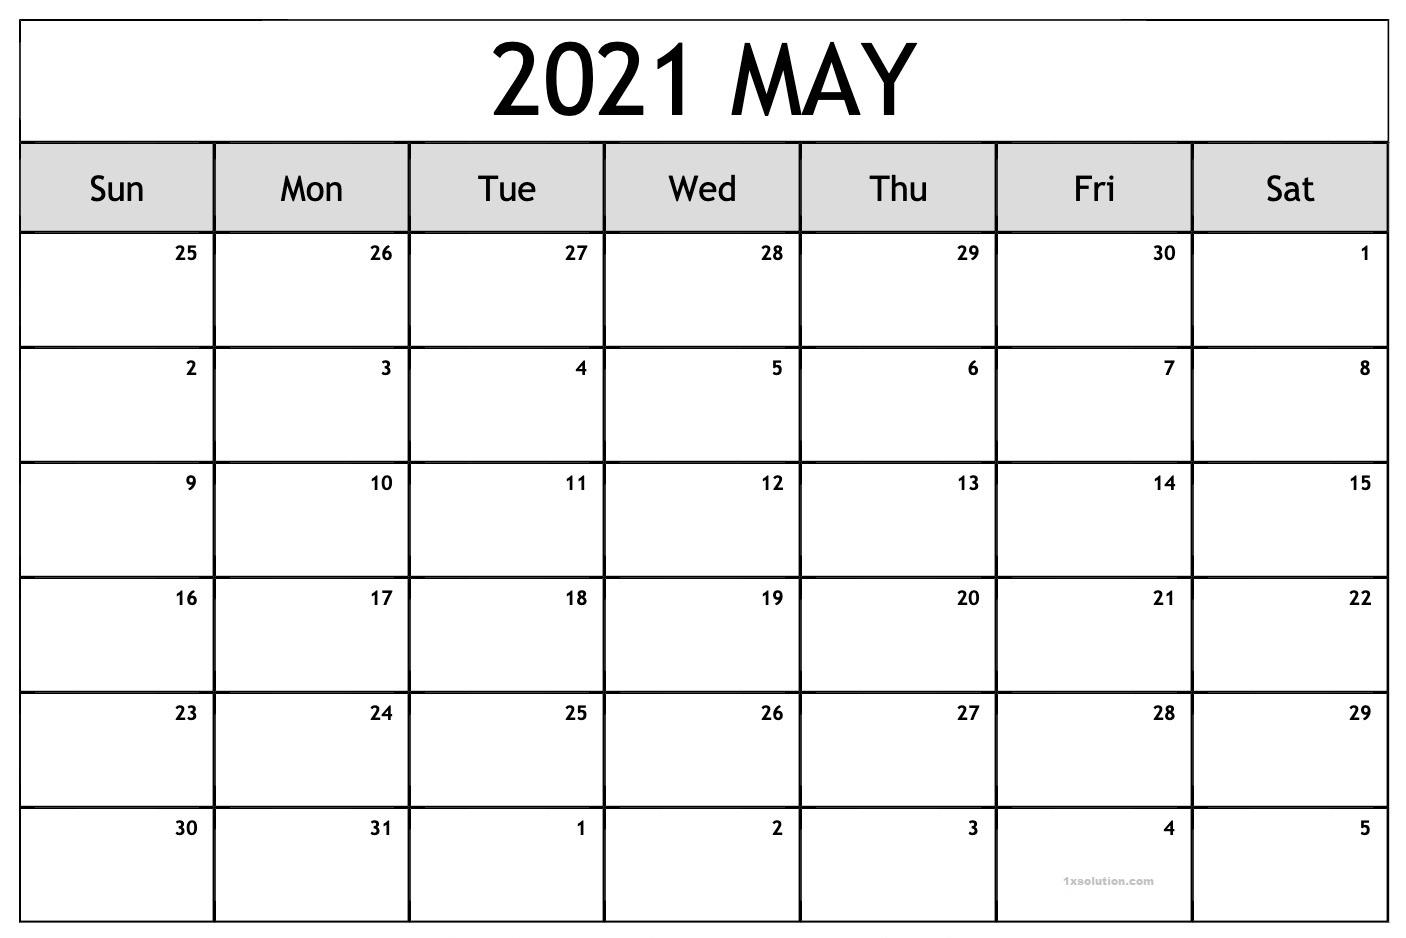 May 2021 Calendar Blank New Design   Calendar